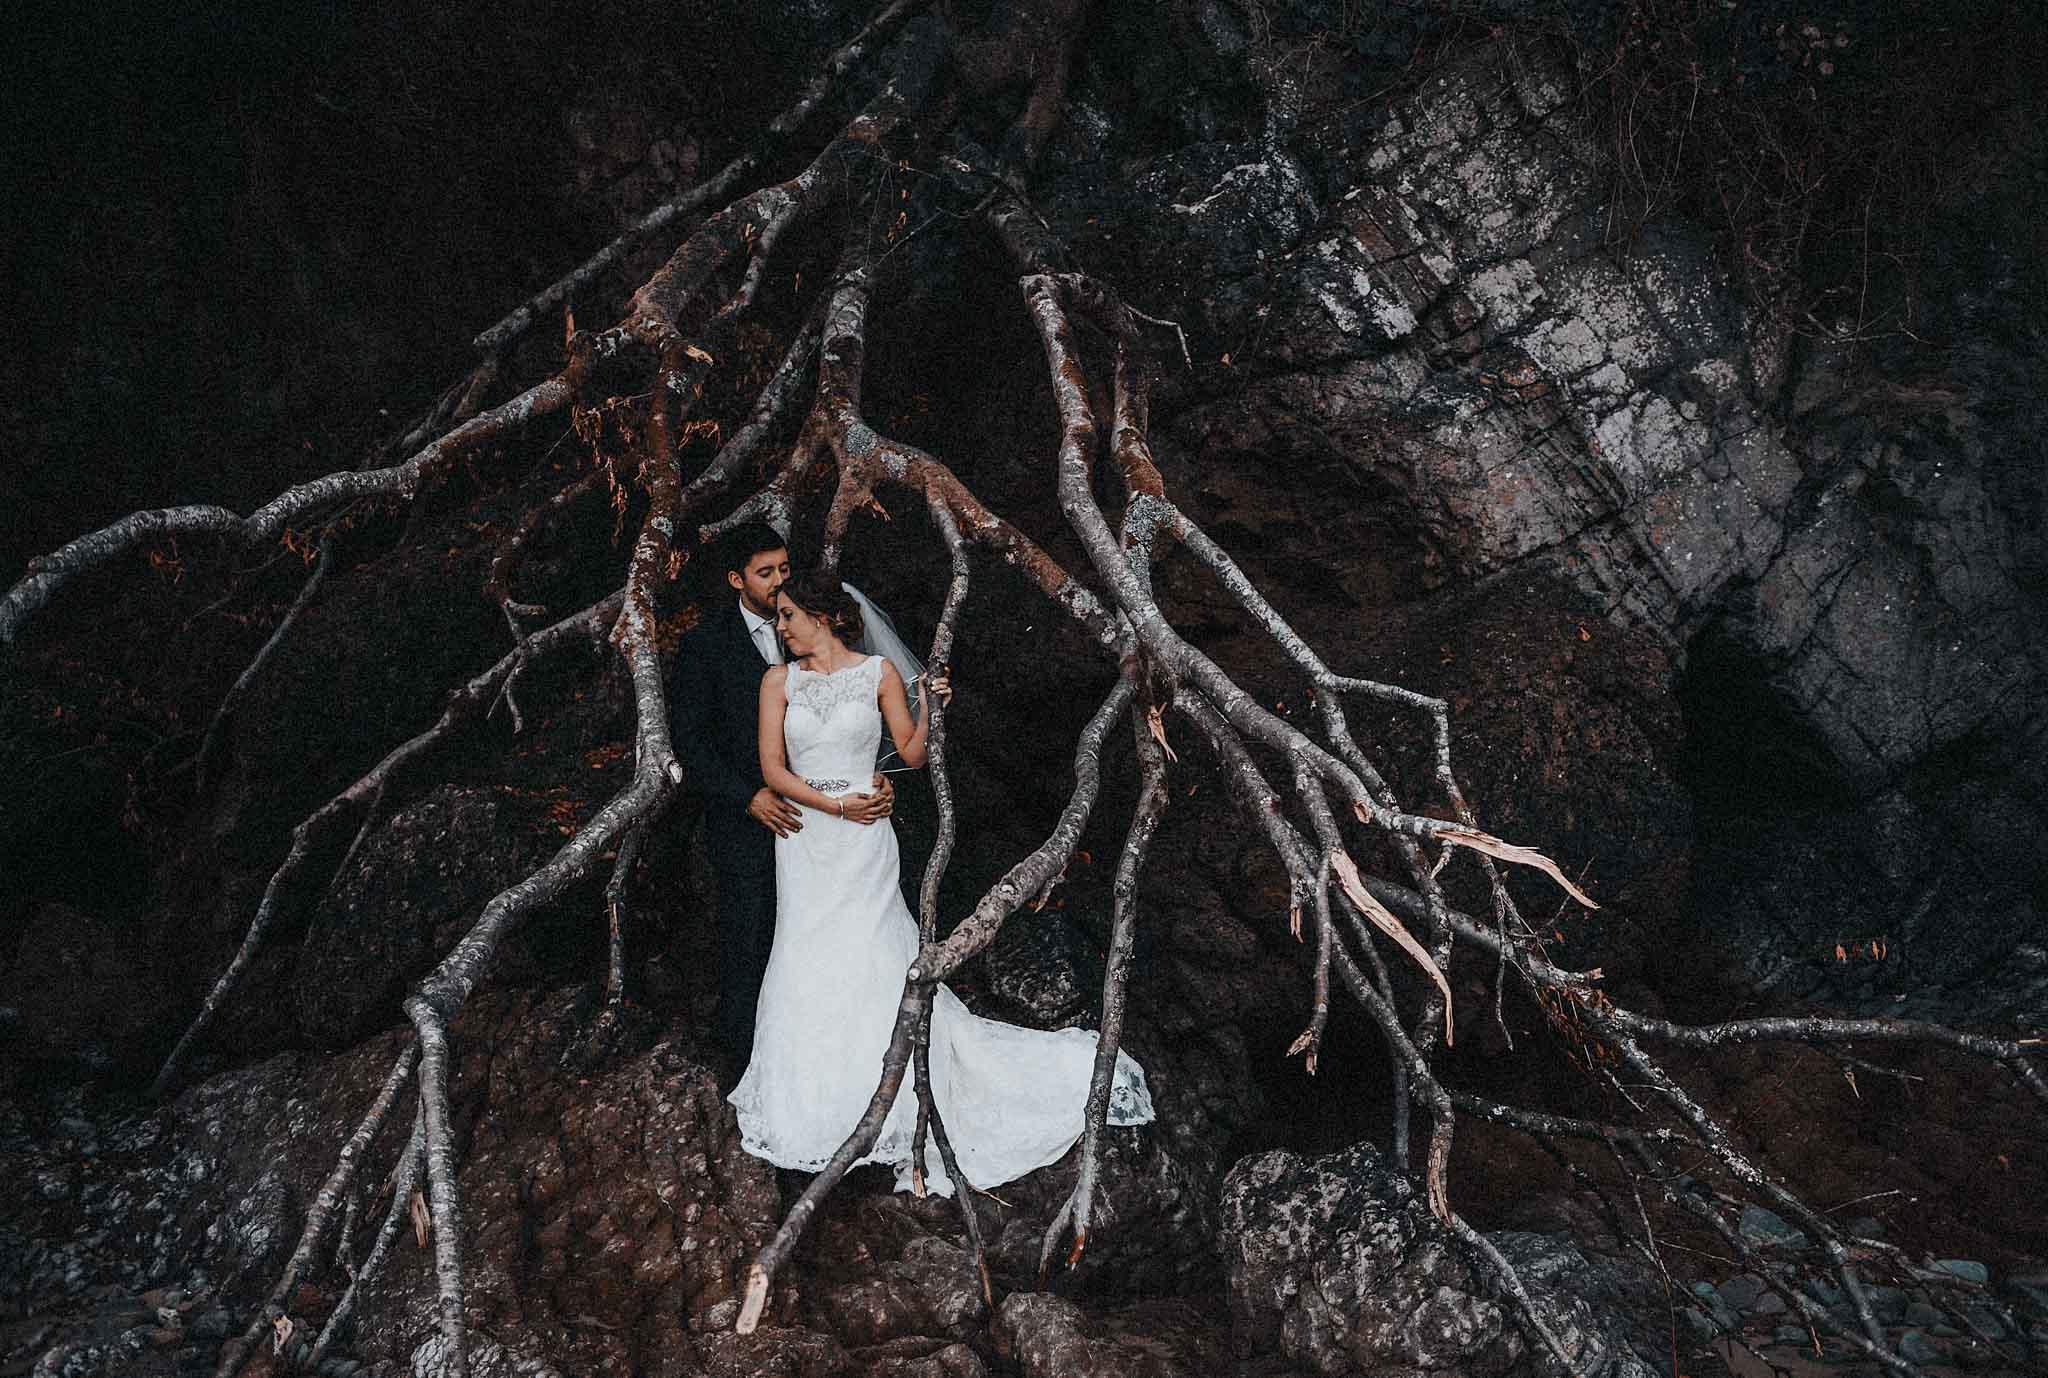 Lookslikefilm_10questions_alex_james_wedding_uk